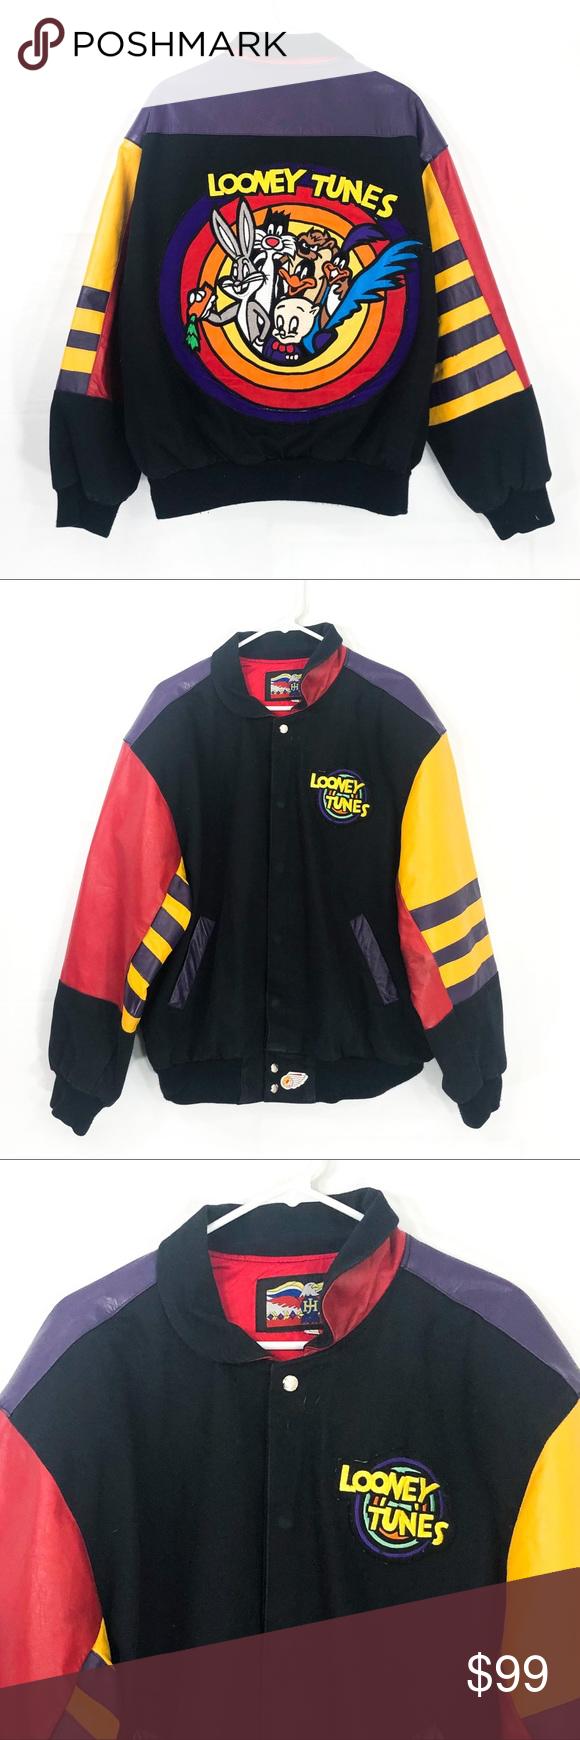 Vintage 1992 Looney Tunes Leather Jacket Jackets Leather Jacket Clothes Design